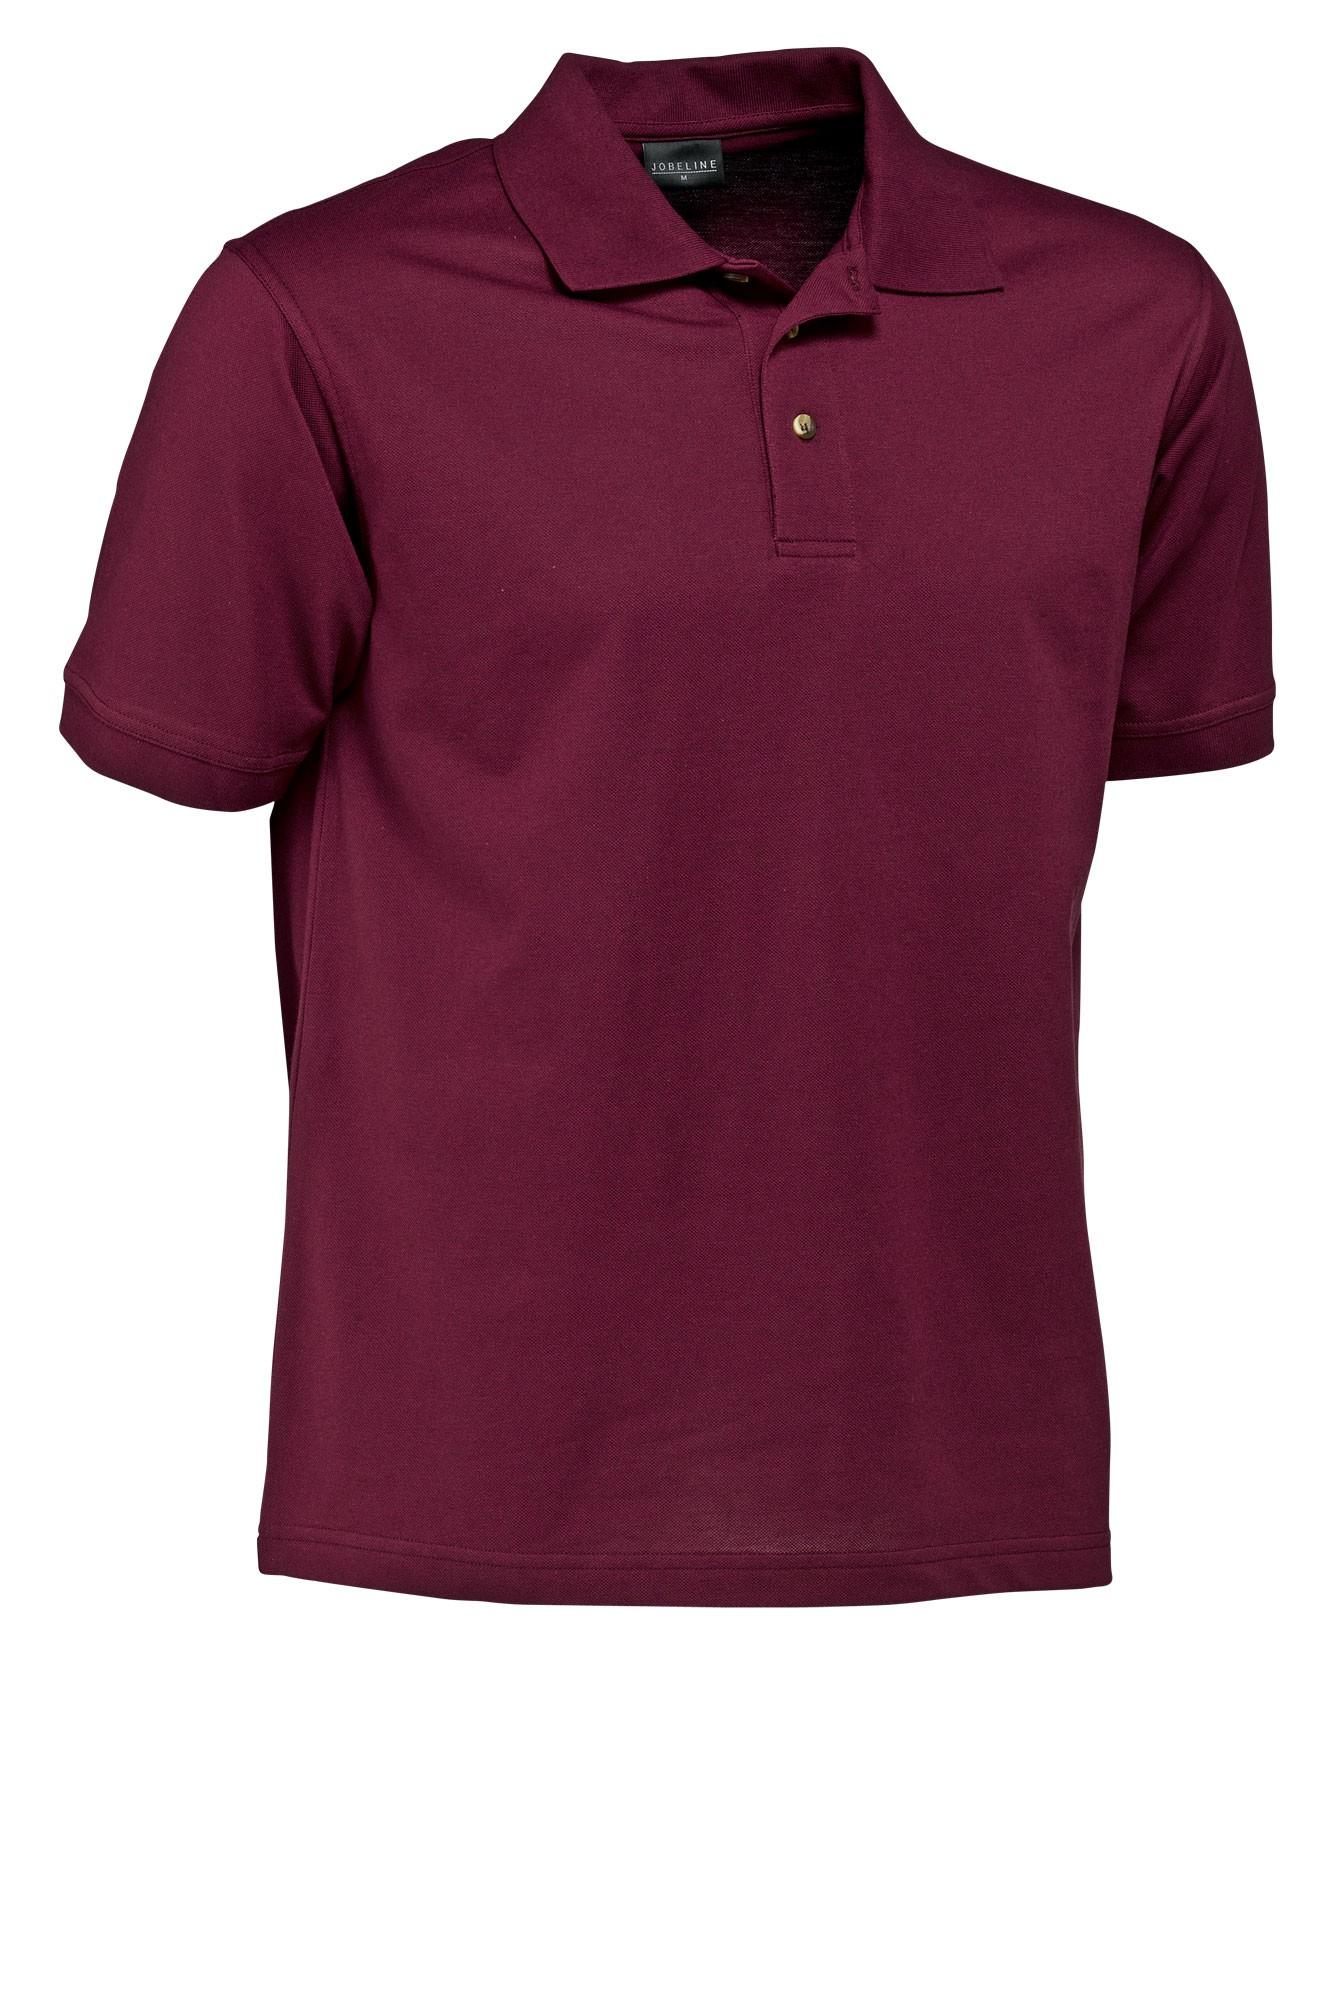 Pánské tričko Fly - bordó